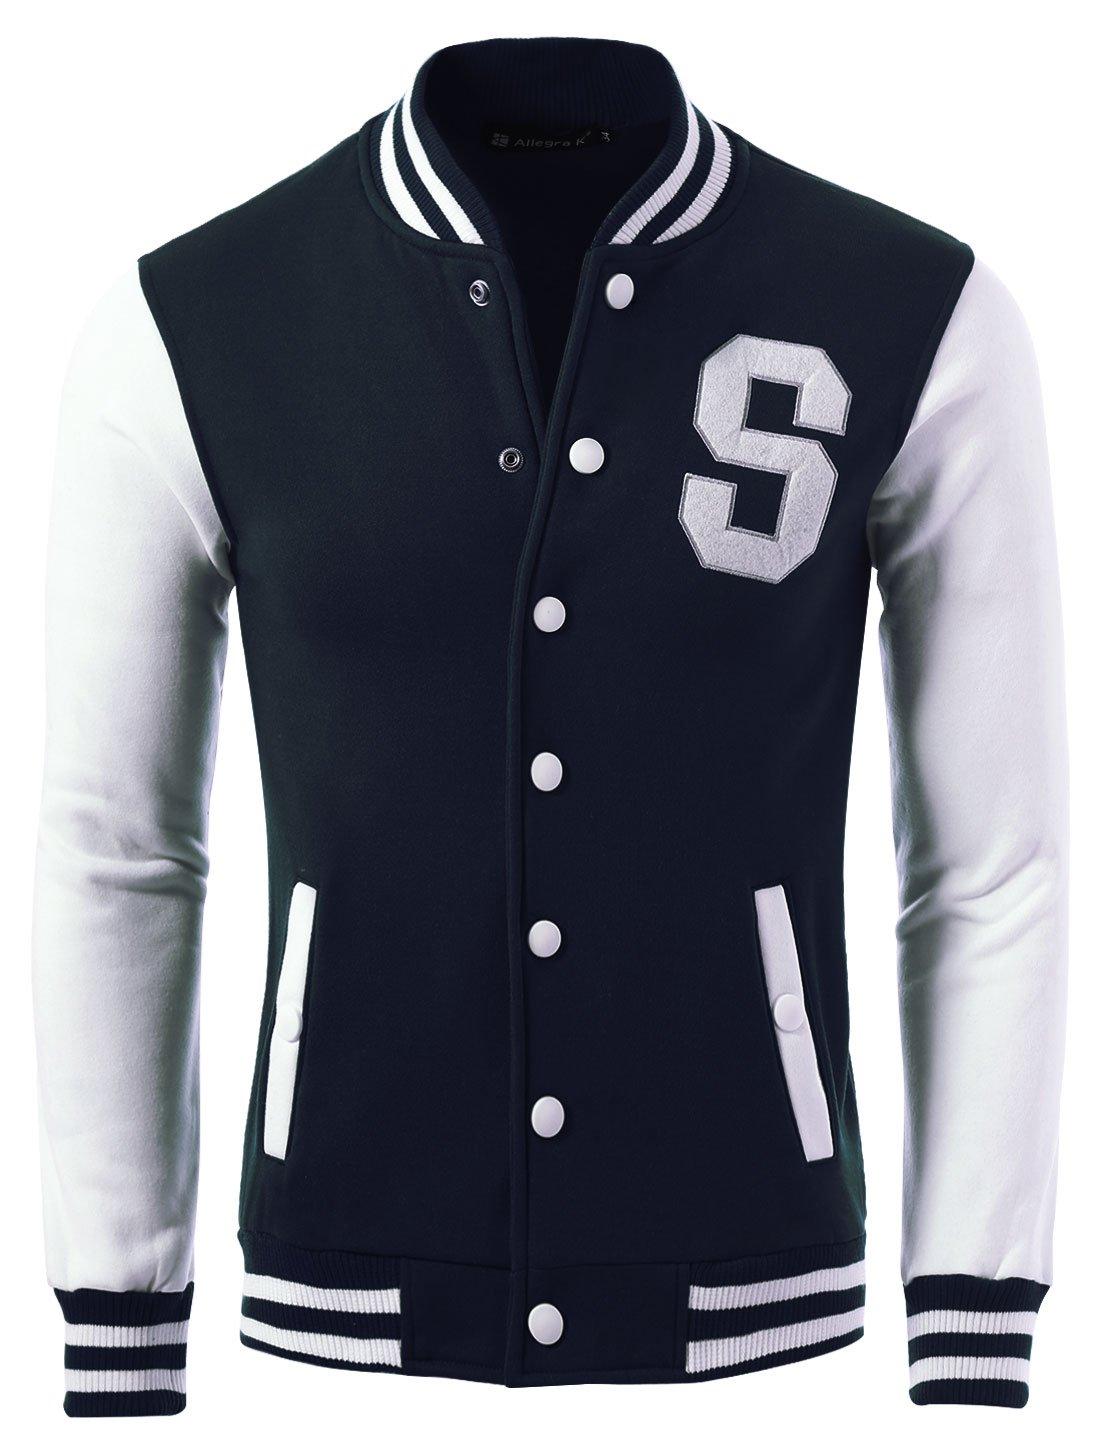 Allegra K Men Letter Pattern Snap Buttons Casual Baseball Jacket Navy Blue S